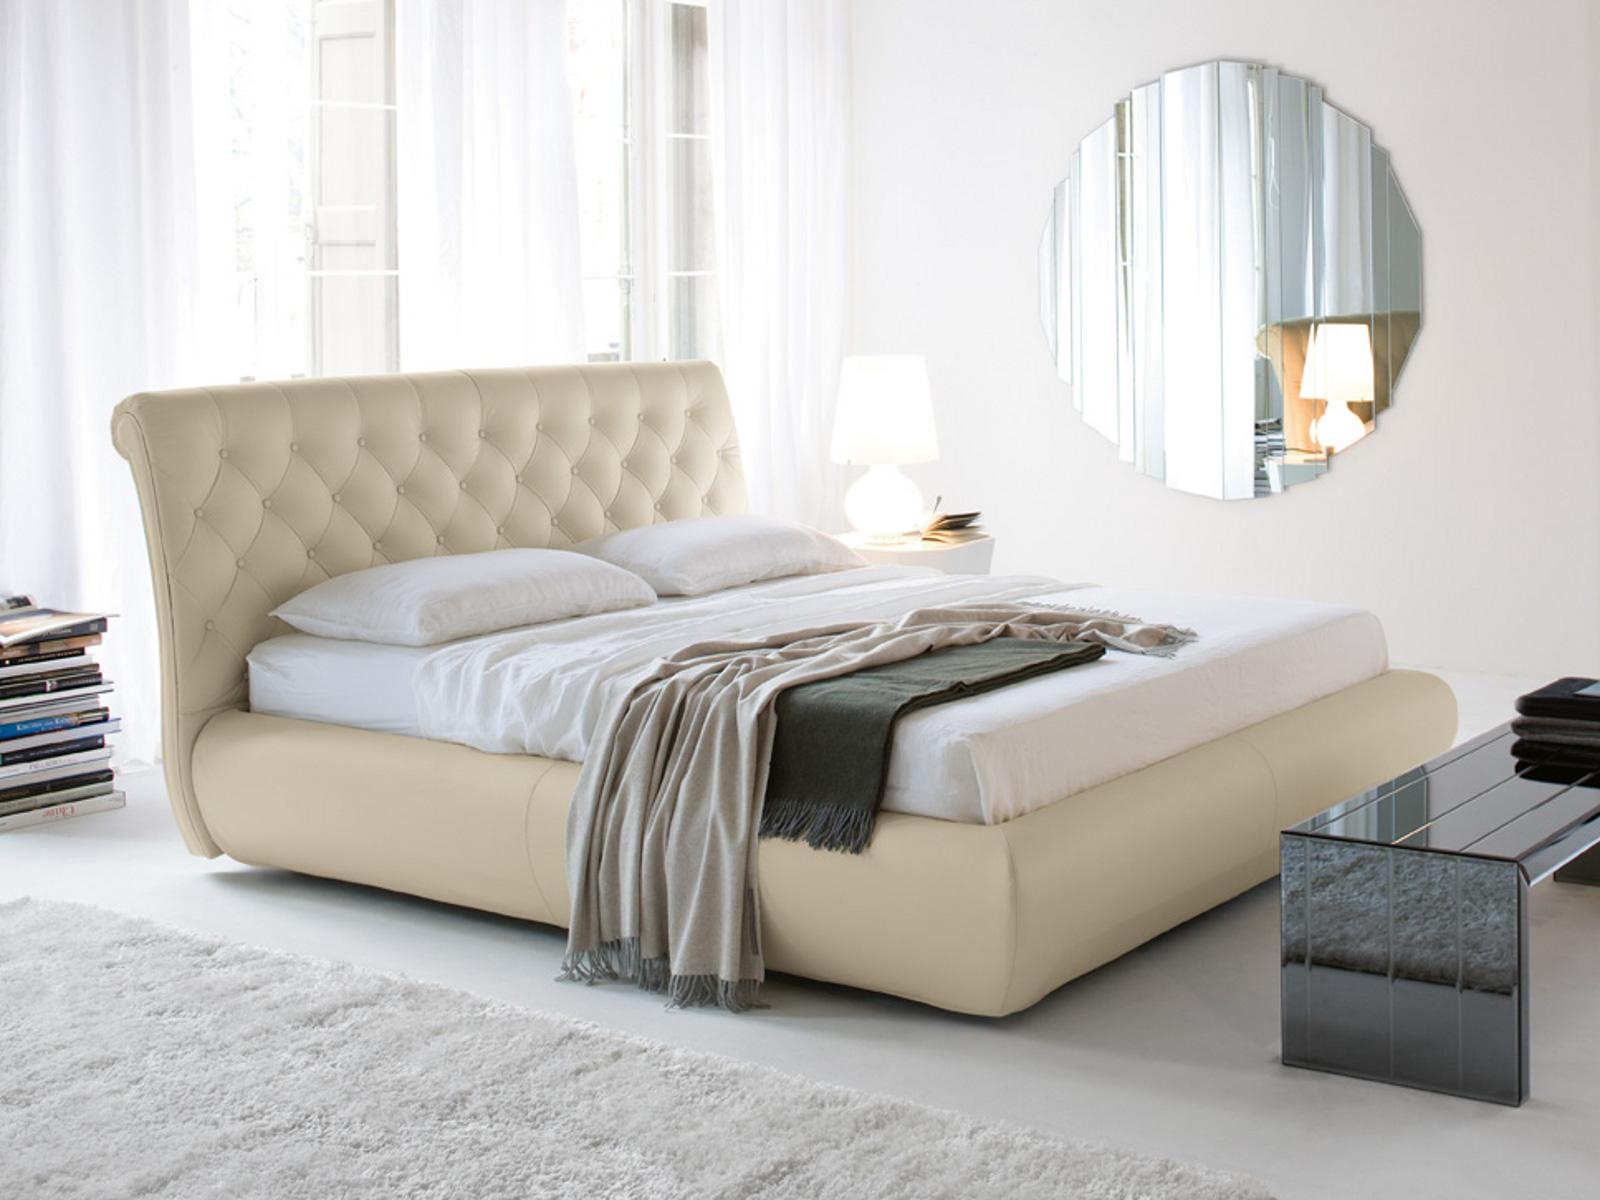 Секс в богатой кровати